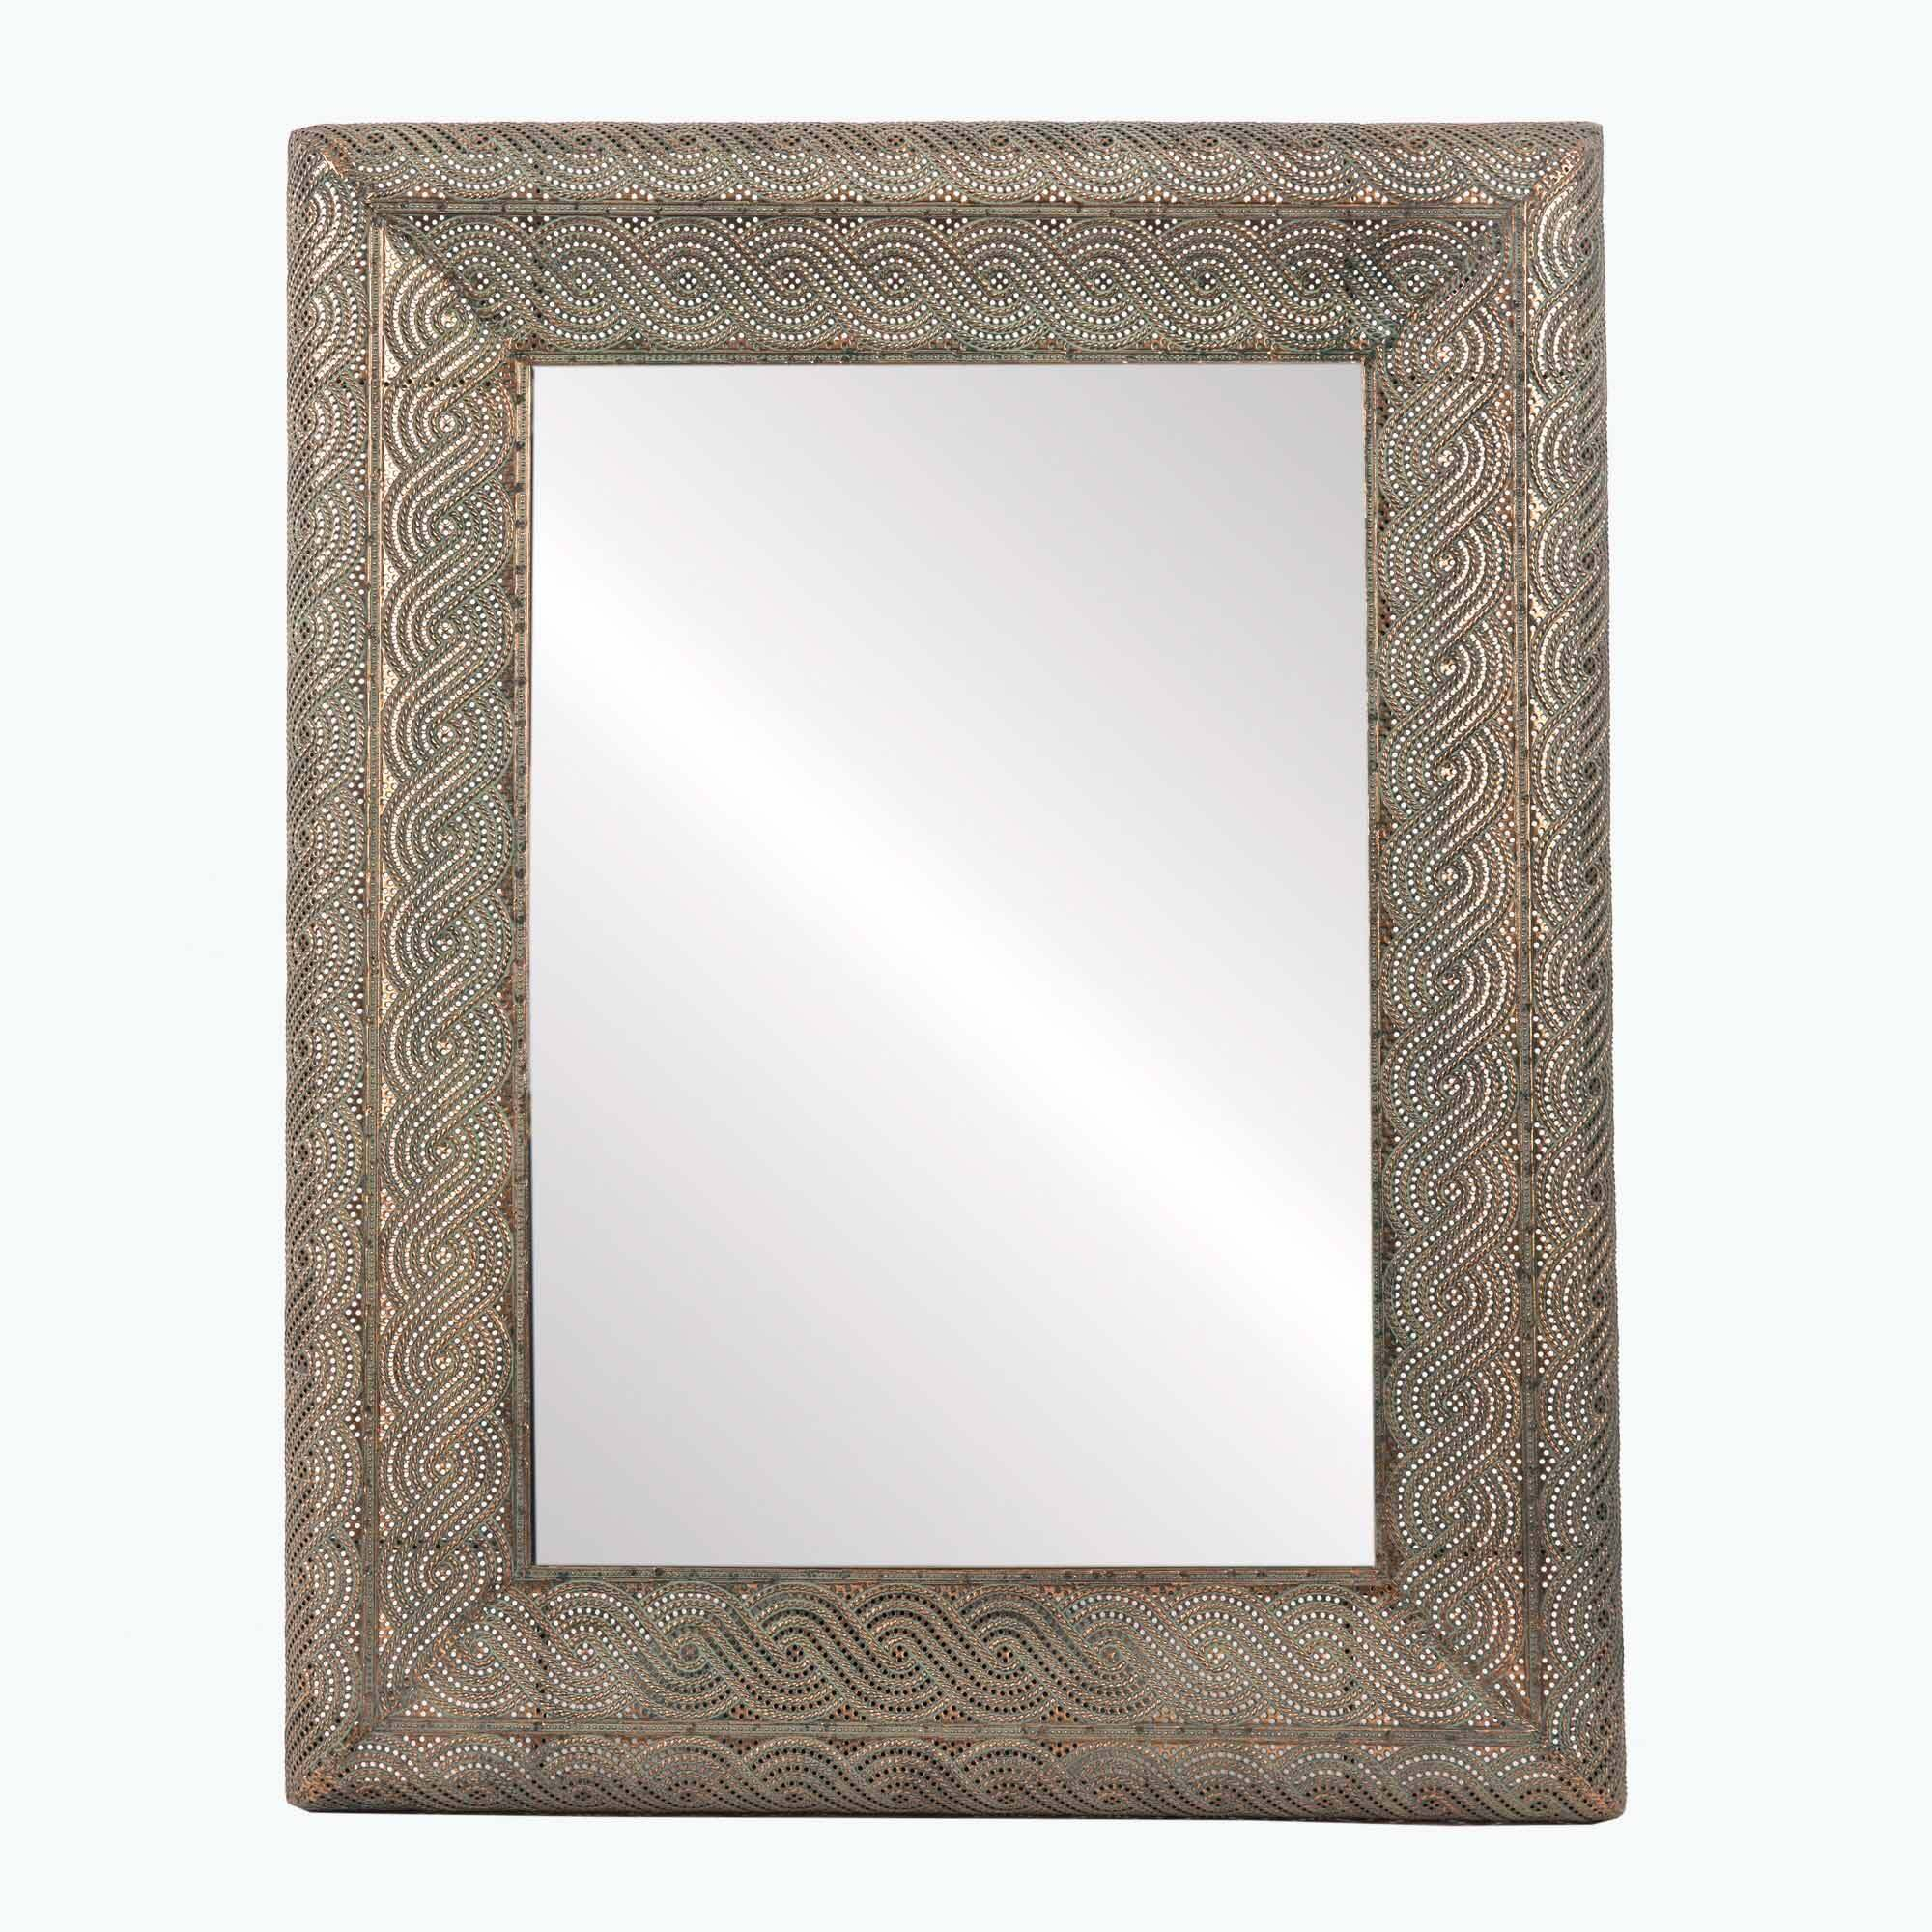 Athena spegel